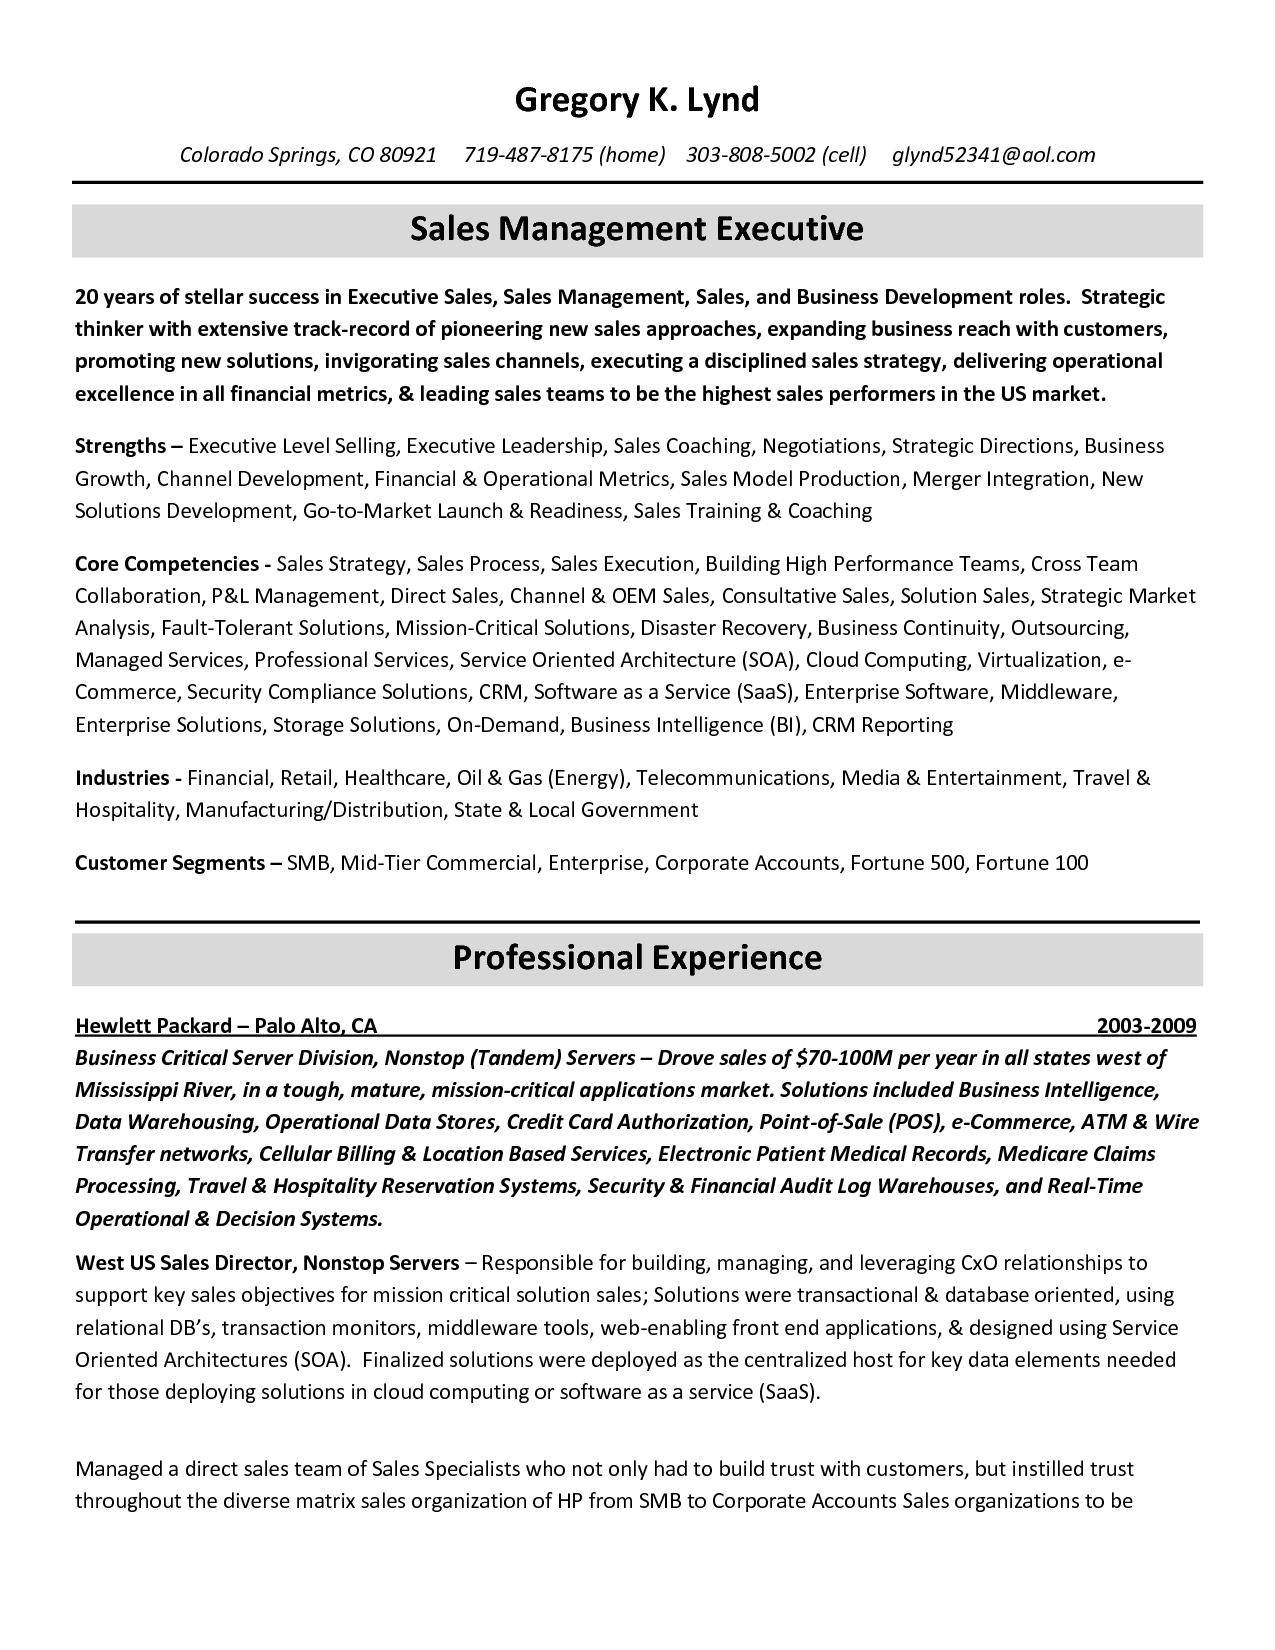 Resume Core Competencies